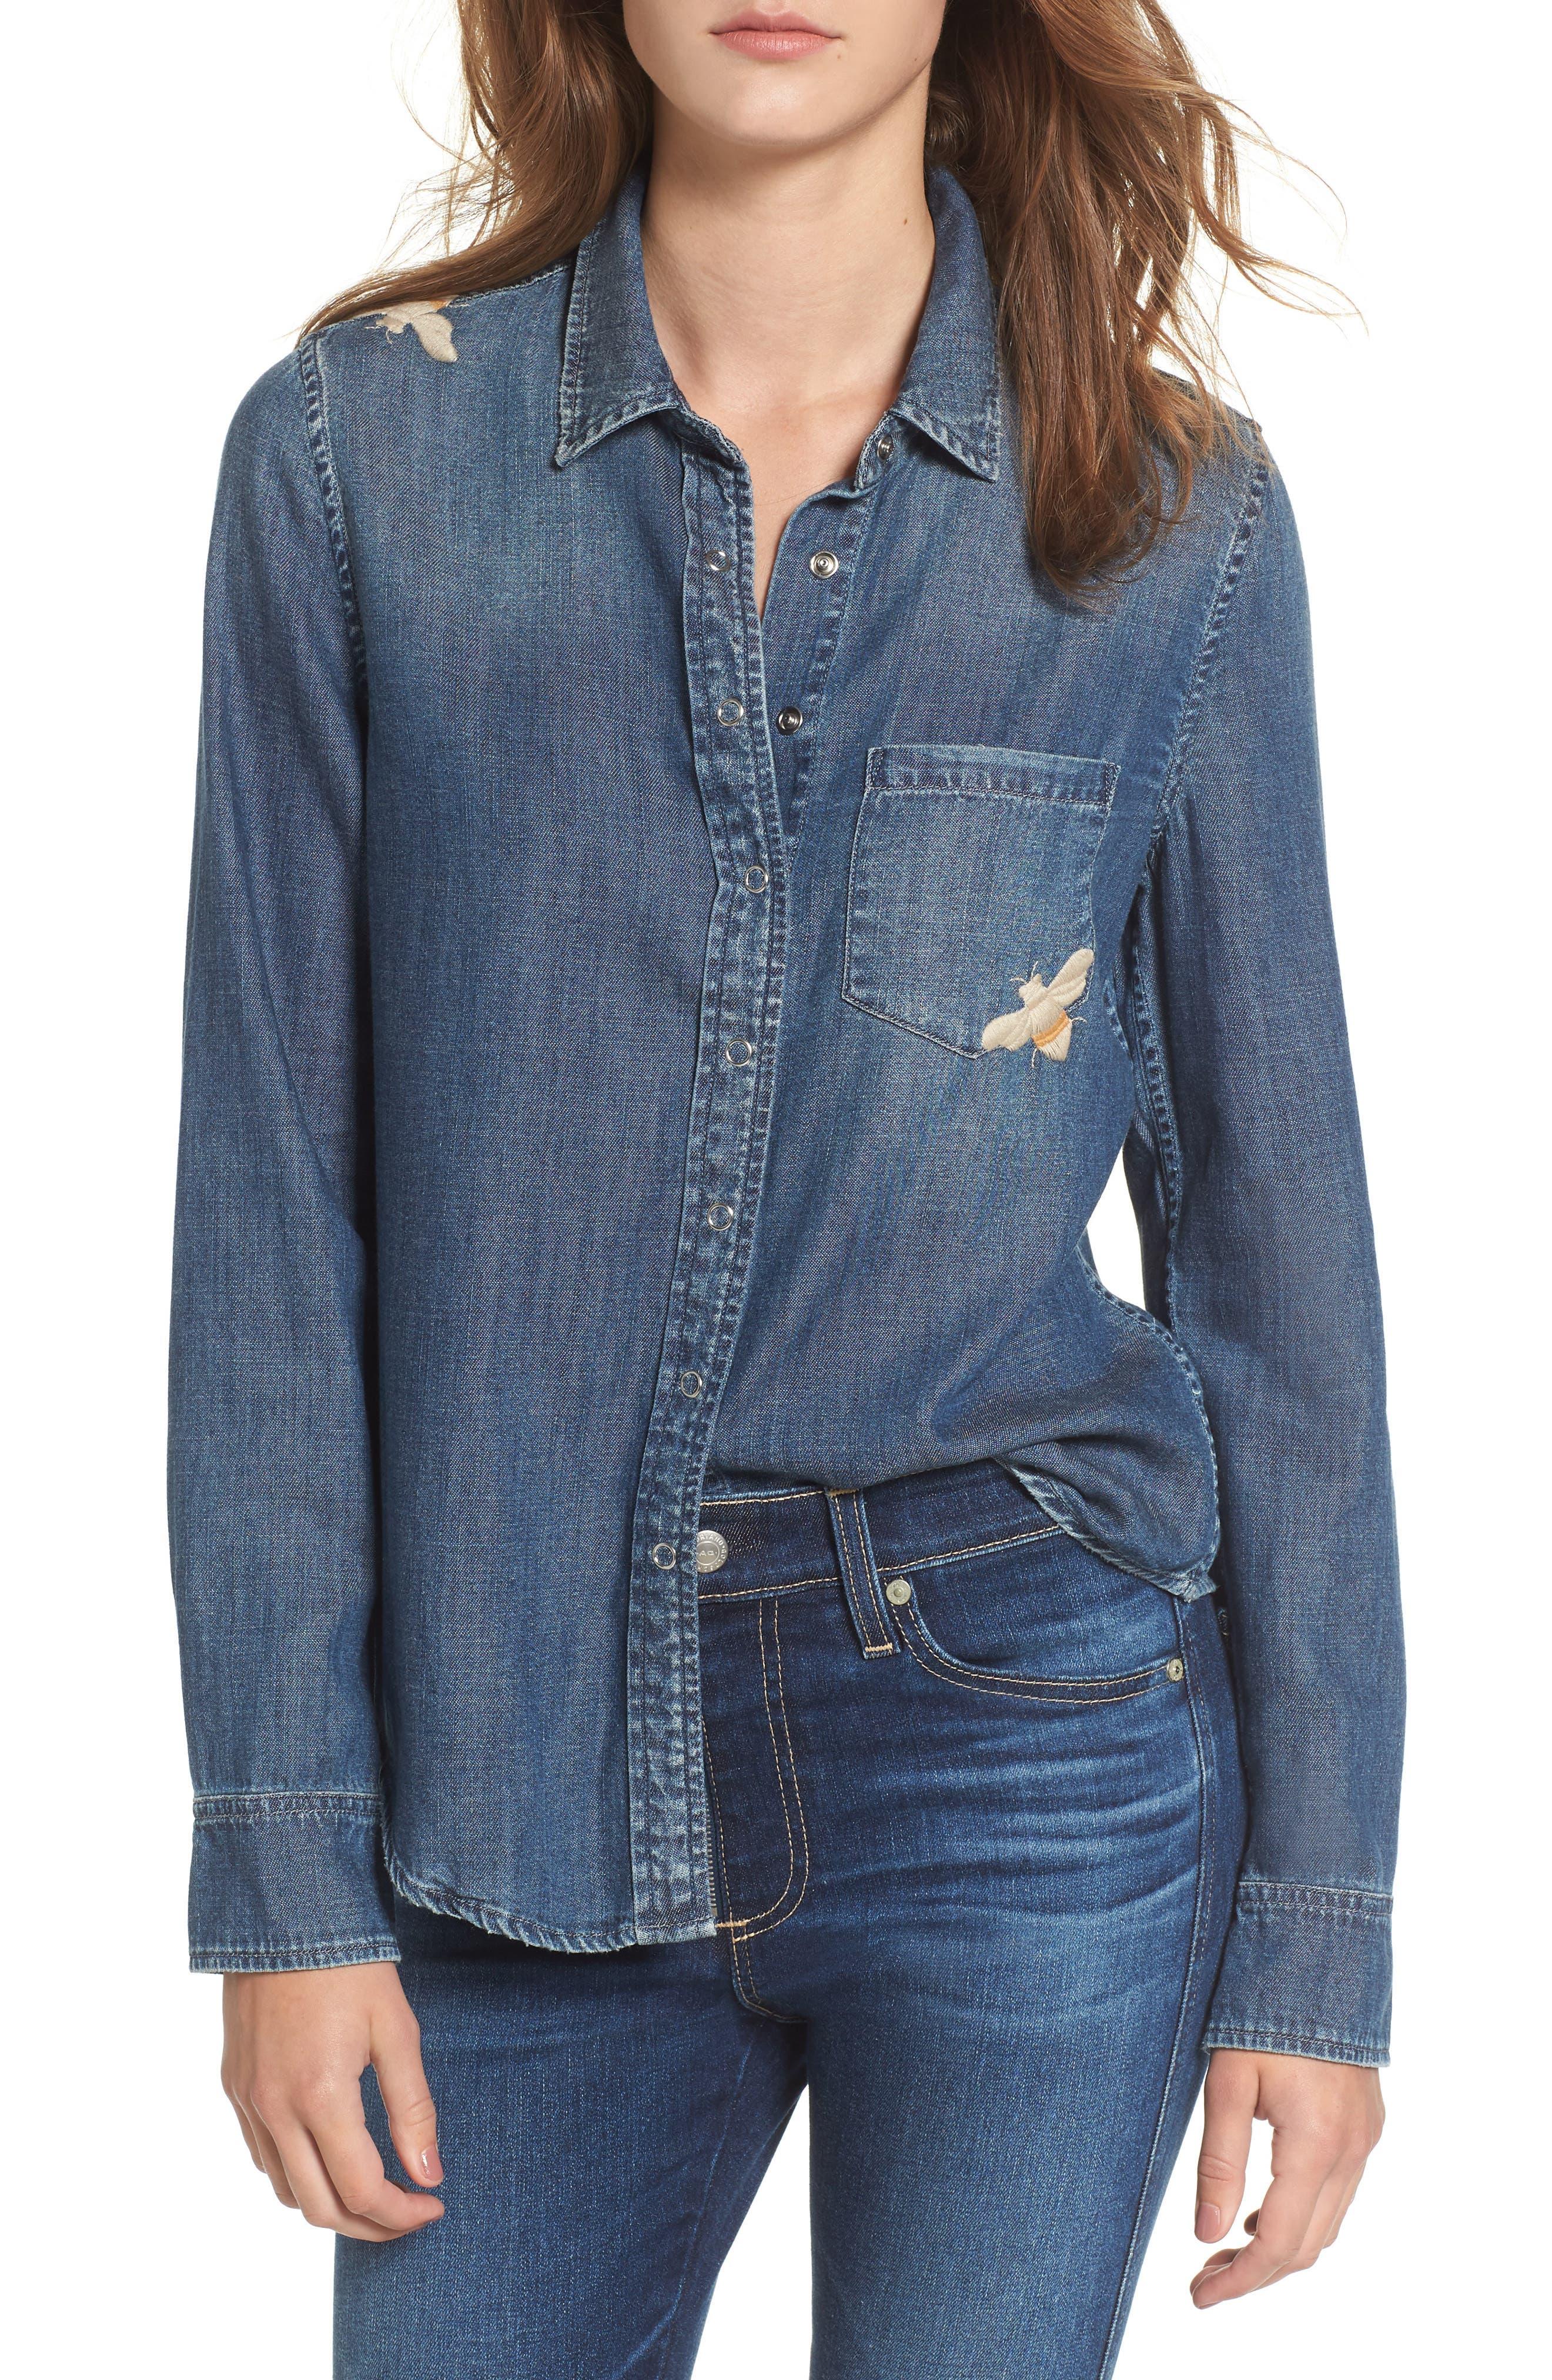 AG Joanna Embroidered Denim Shirt